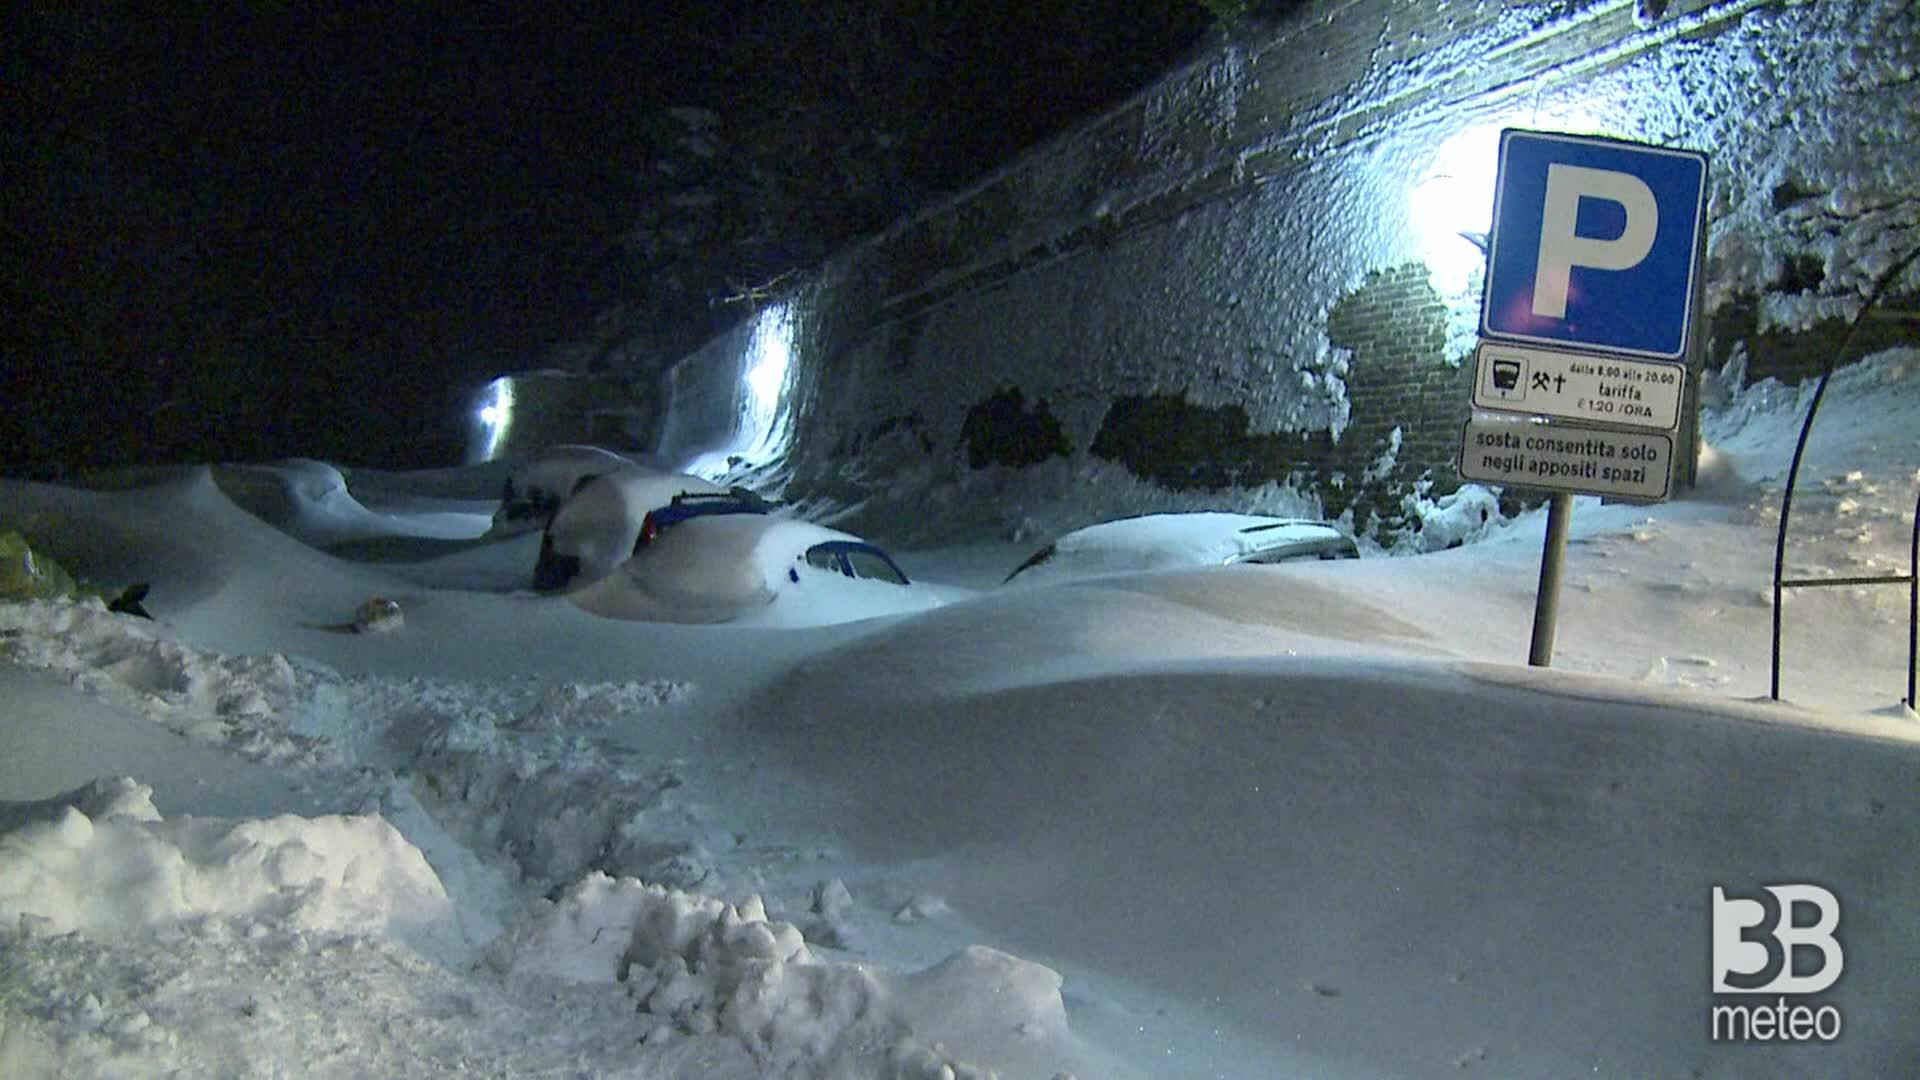 Auto sommerse sotto la neve: la nevicata passata alla storia